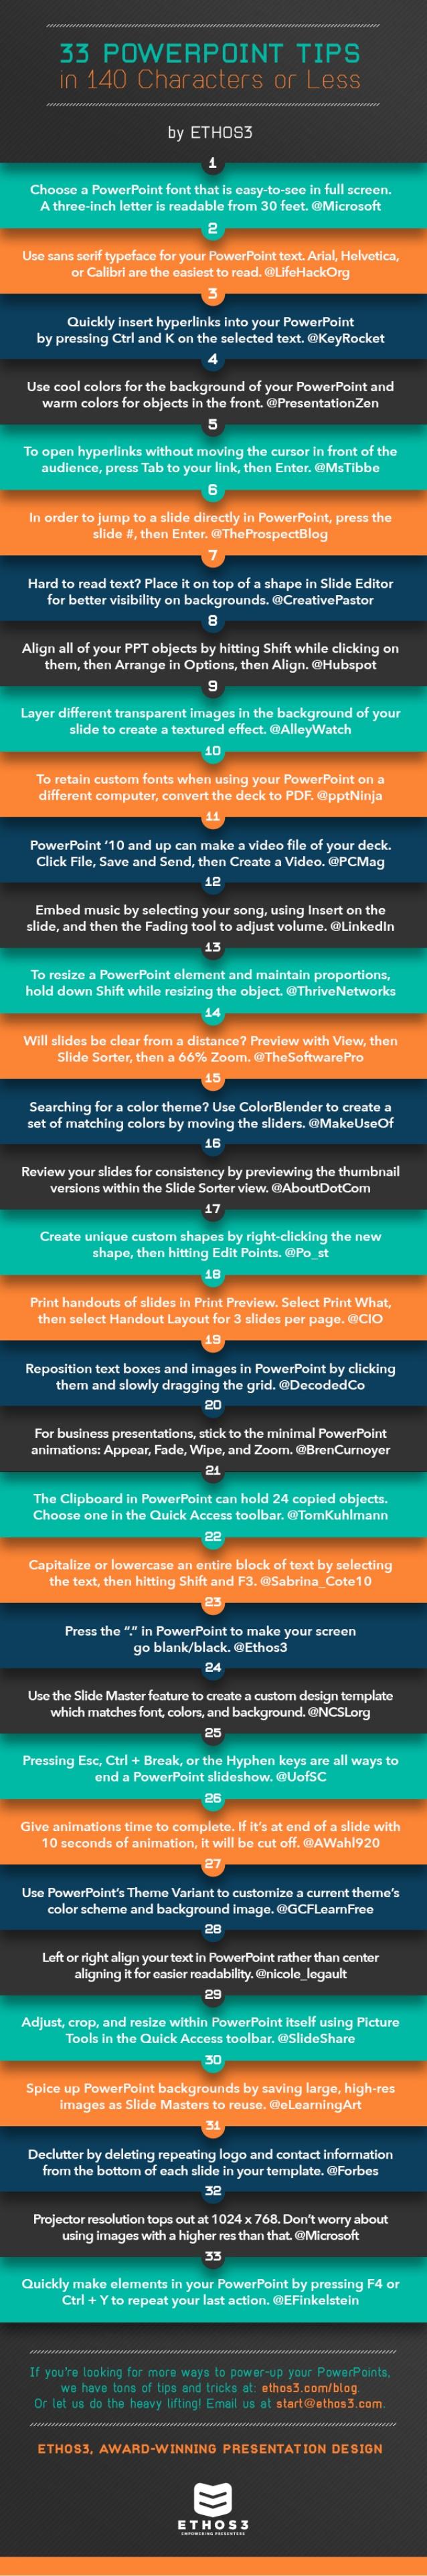 33 consejos sobre PowerPoint en 140 caracteres